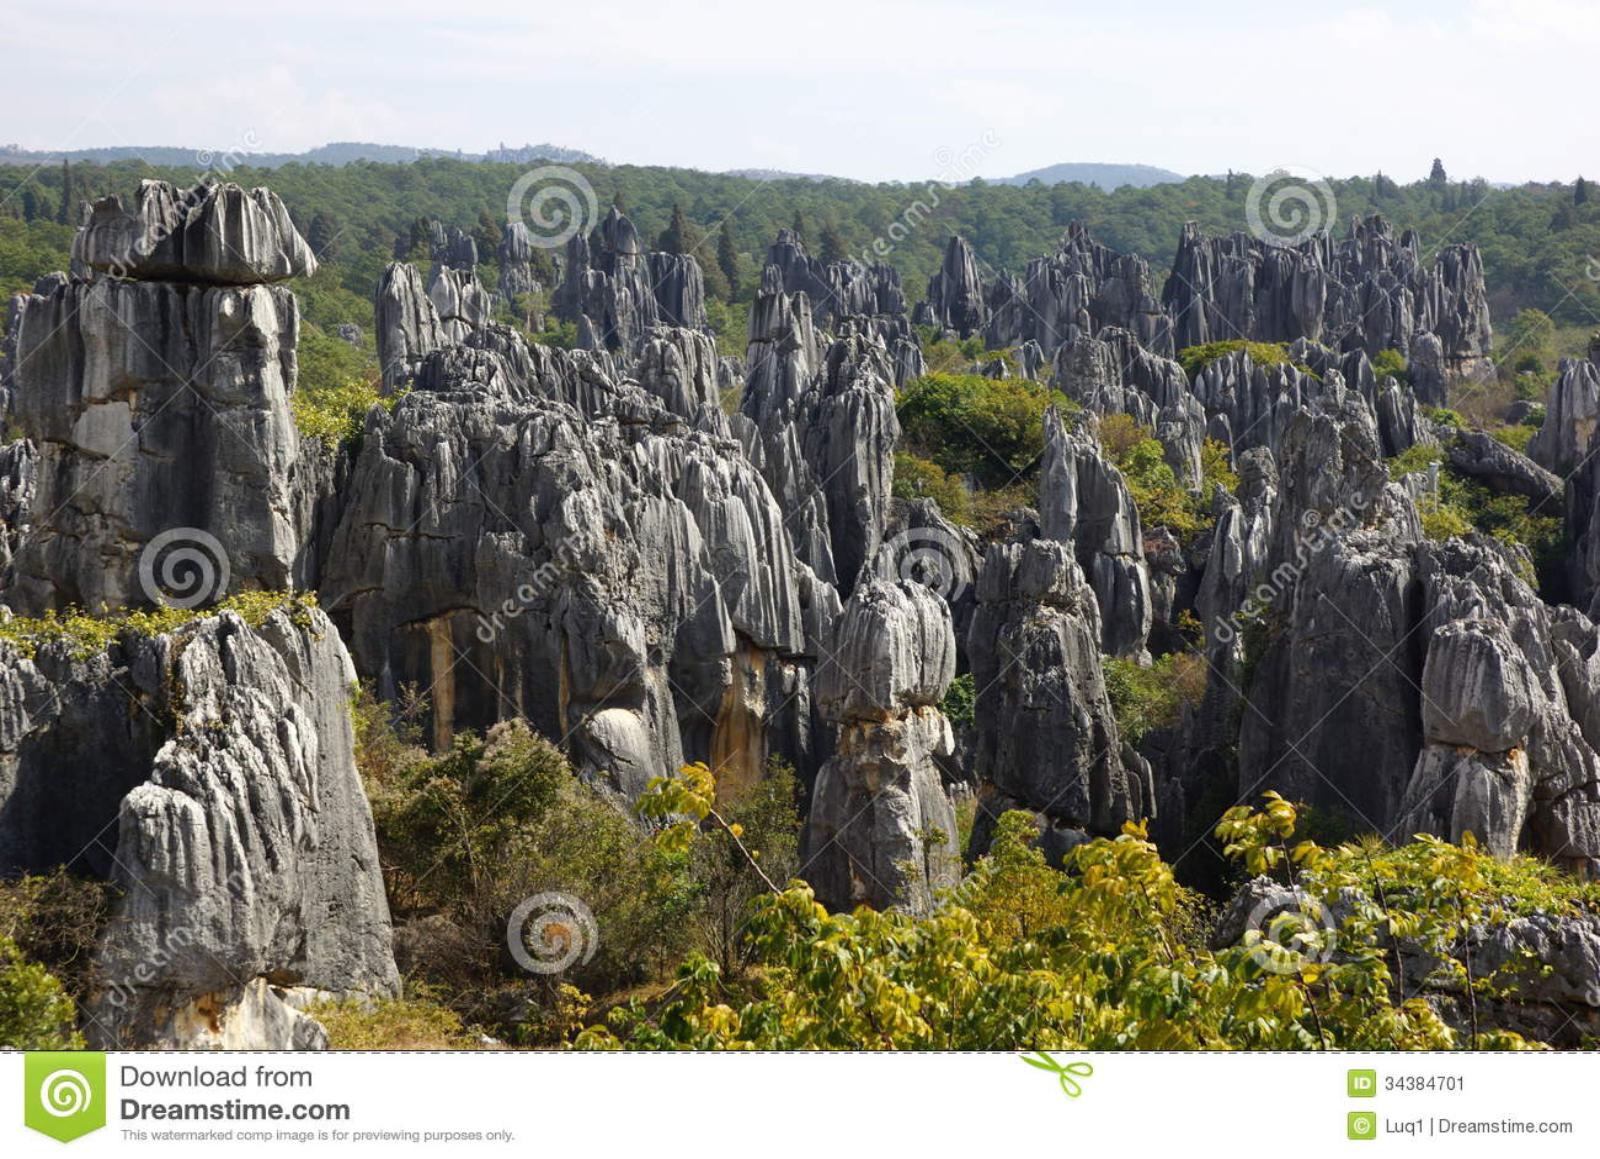 Floresta da pedra de Shilin em Kunming, Yunnan, China